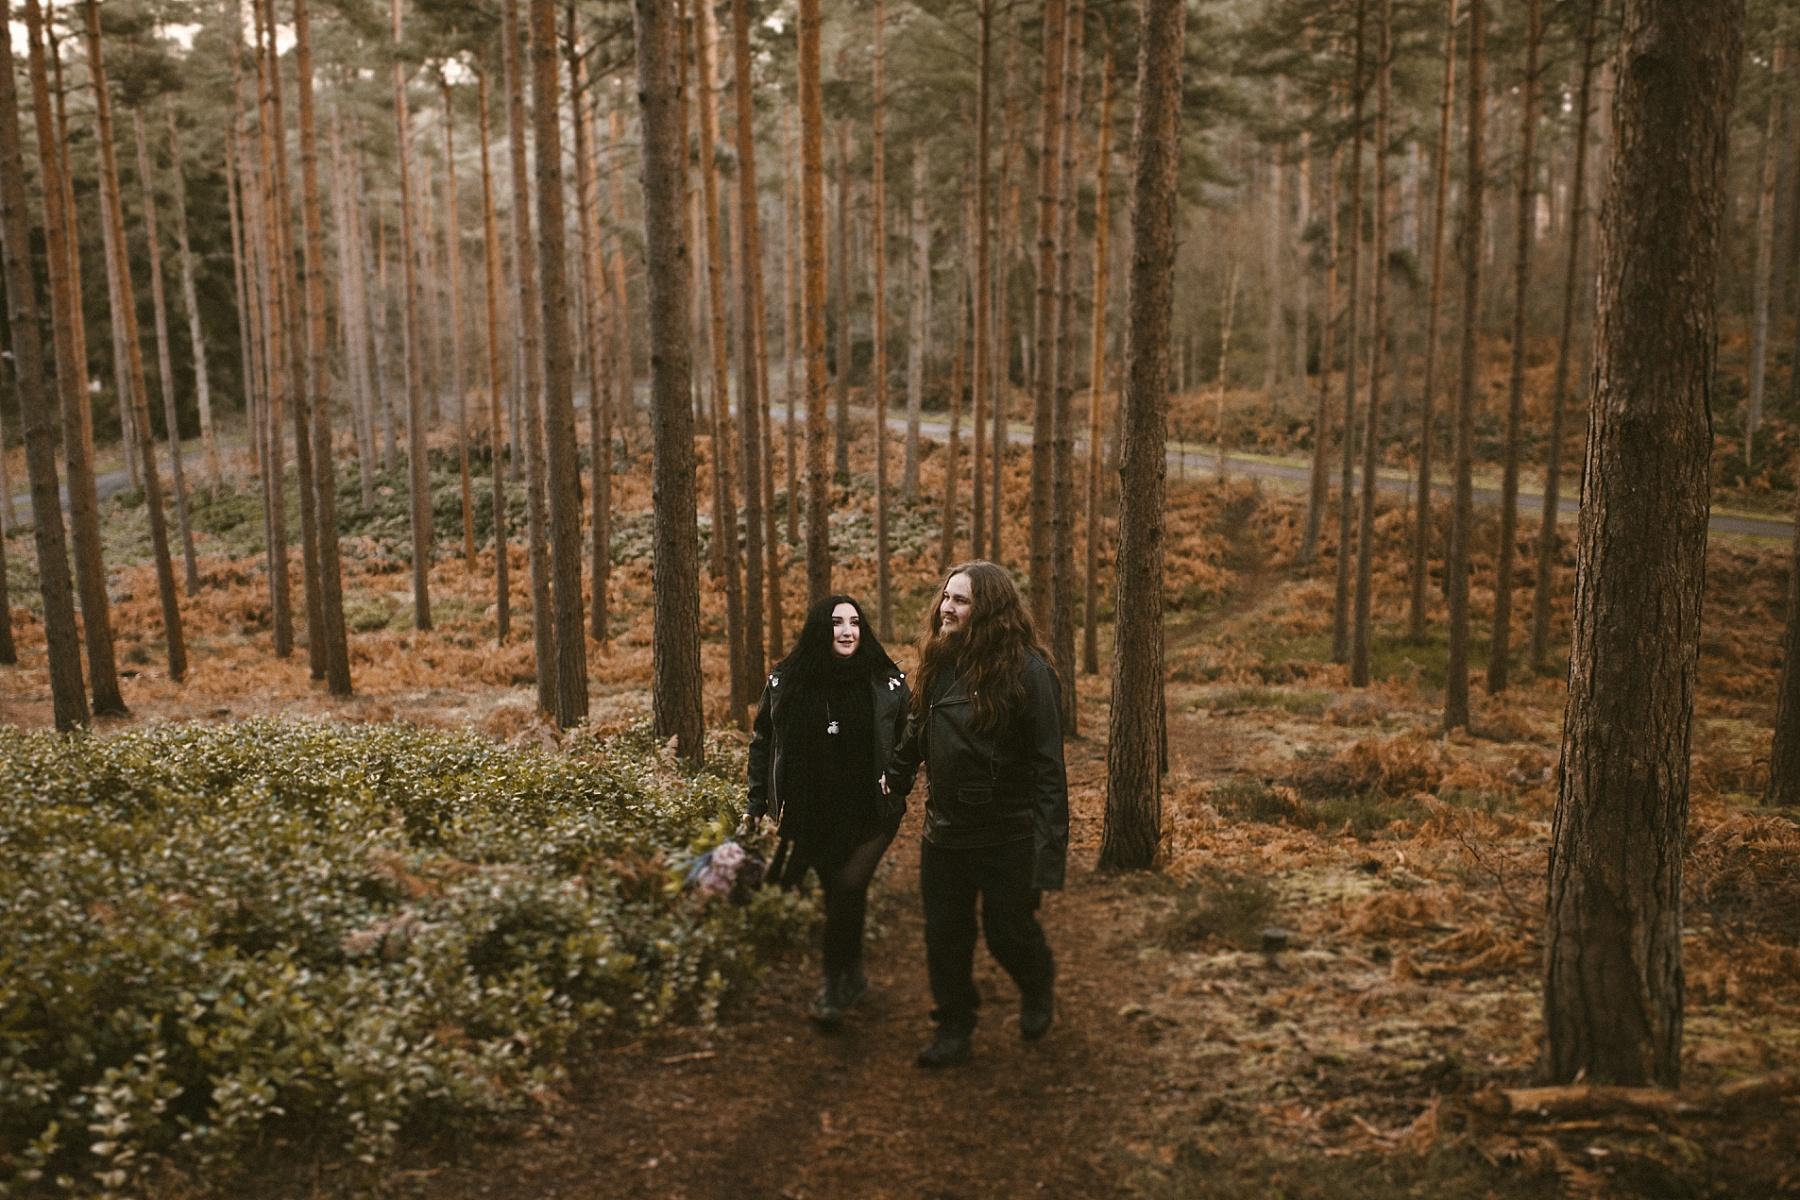 wedding photo taken in the woods